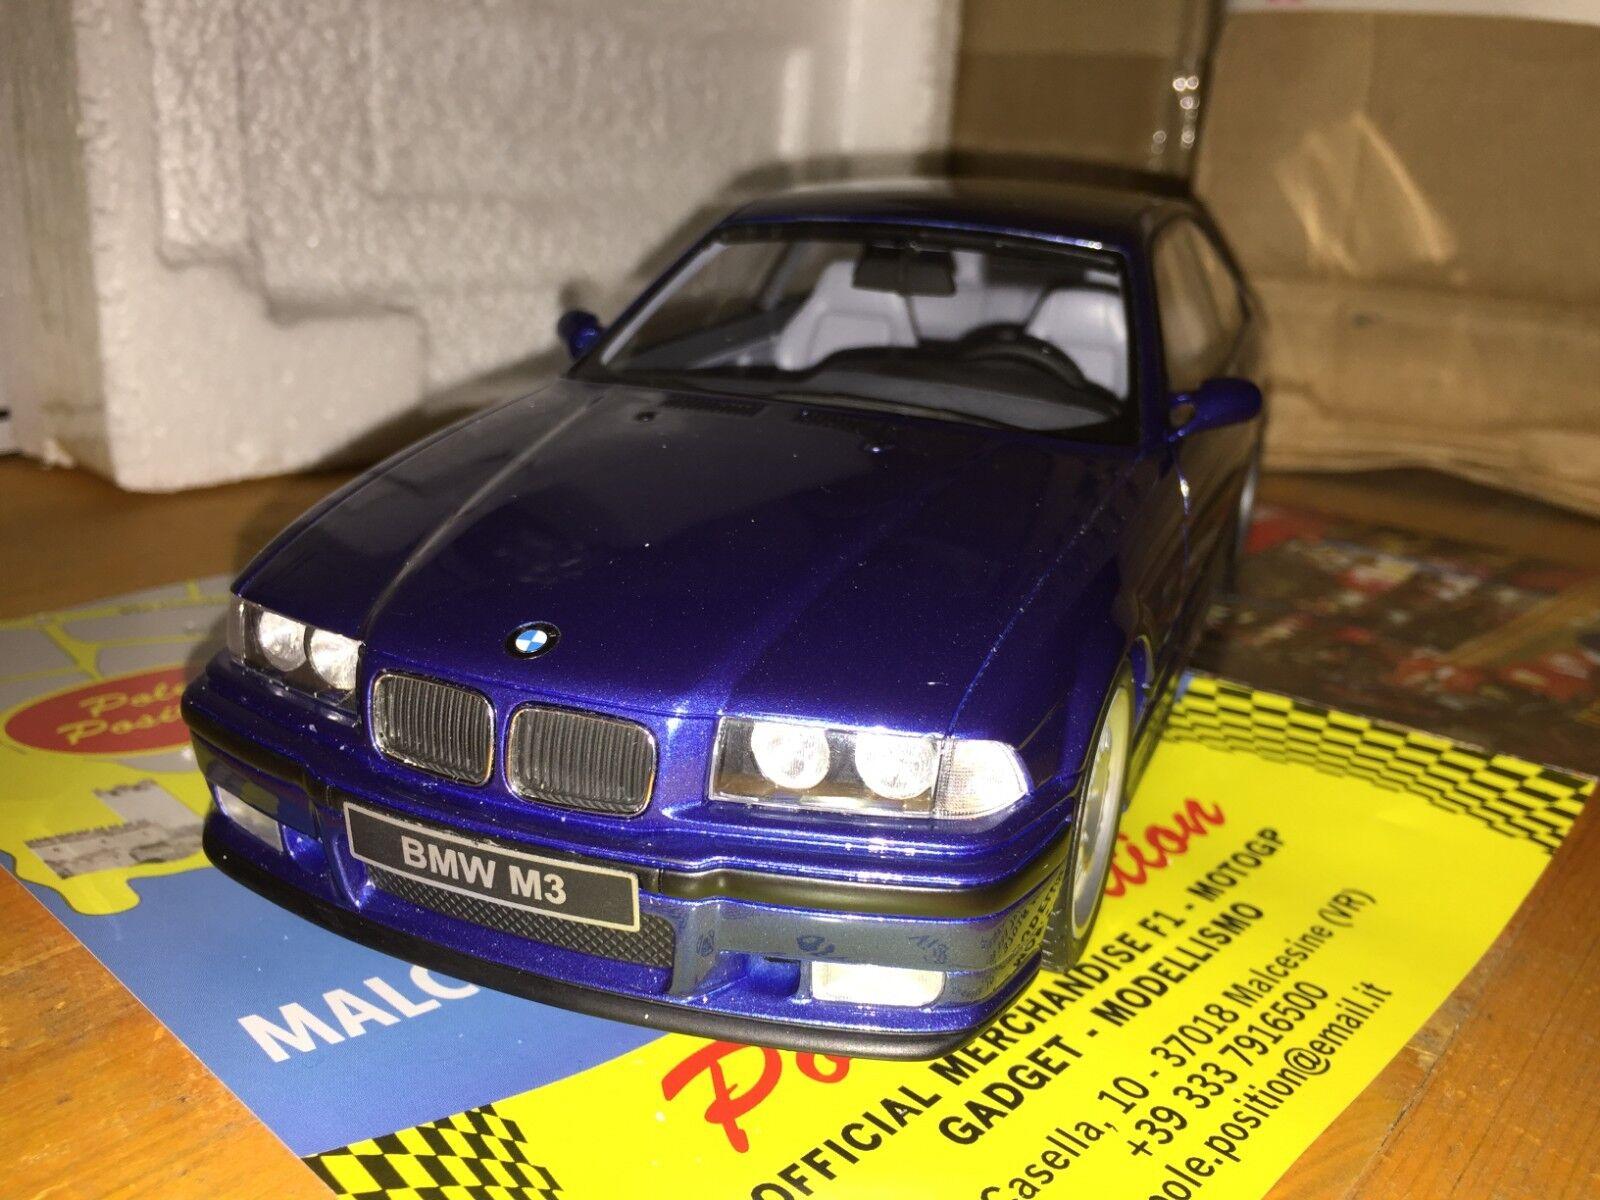 Ot625 1 18 OTTOMOBILE BMW m3 e36 3.2 bluee Metallic NEW Free Shipping Worldwide